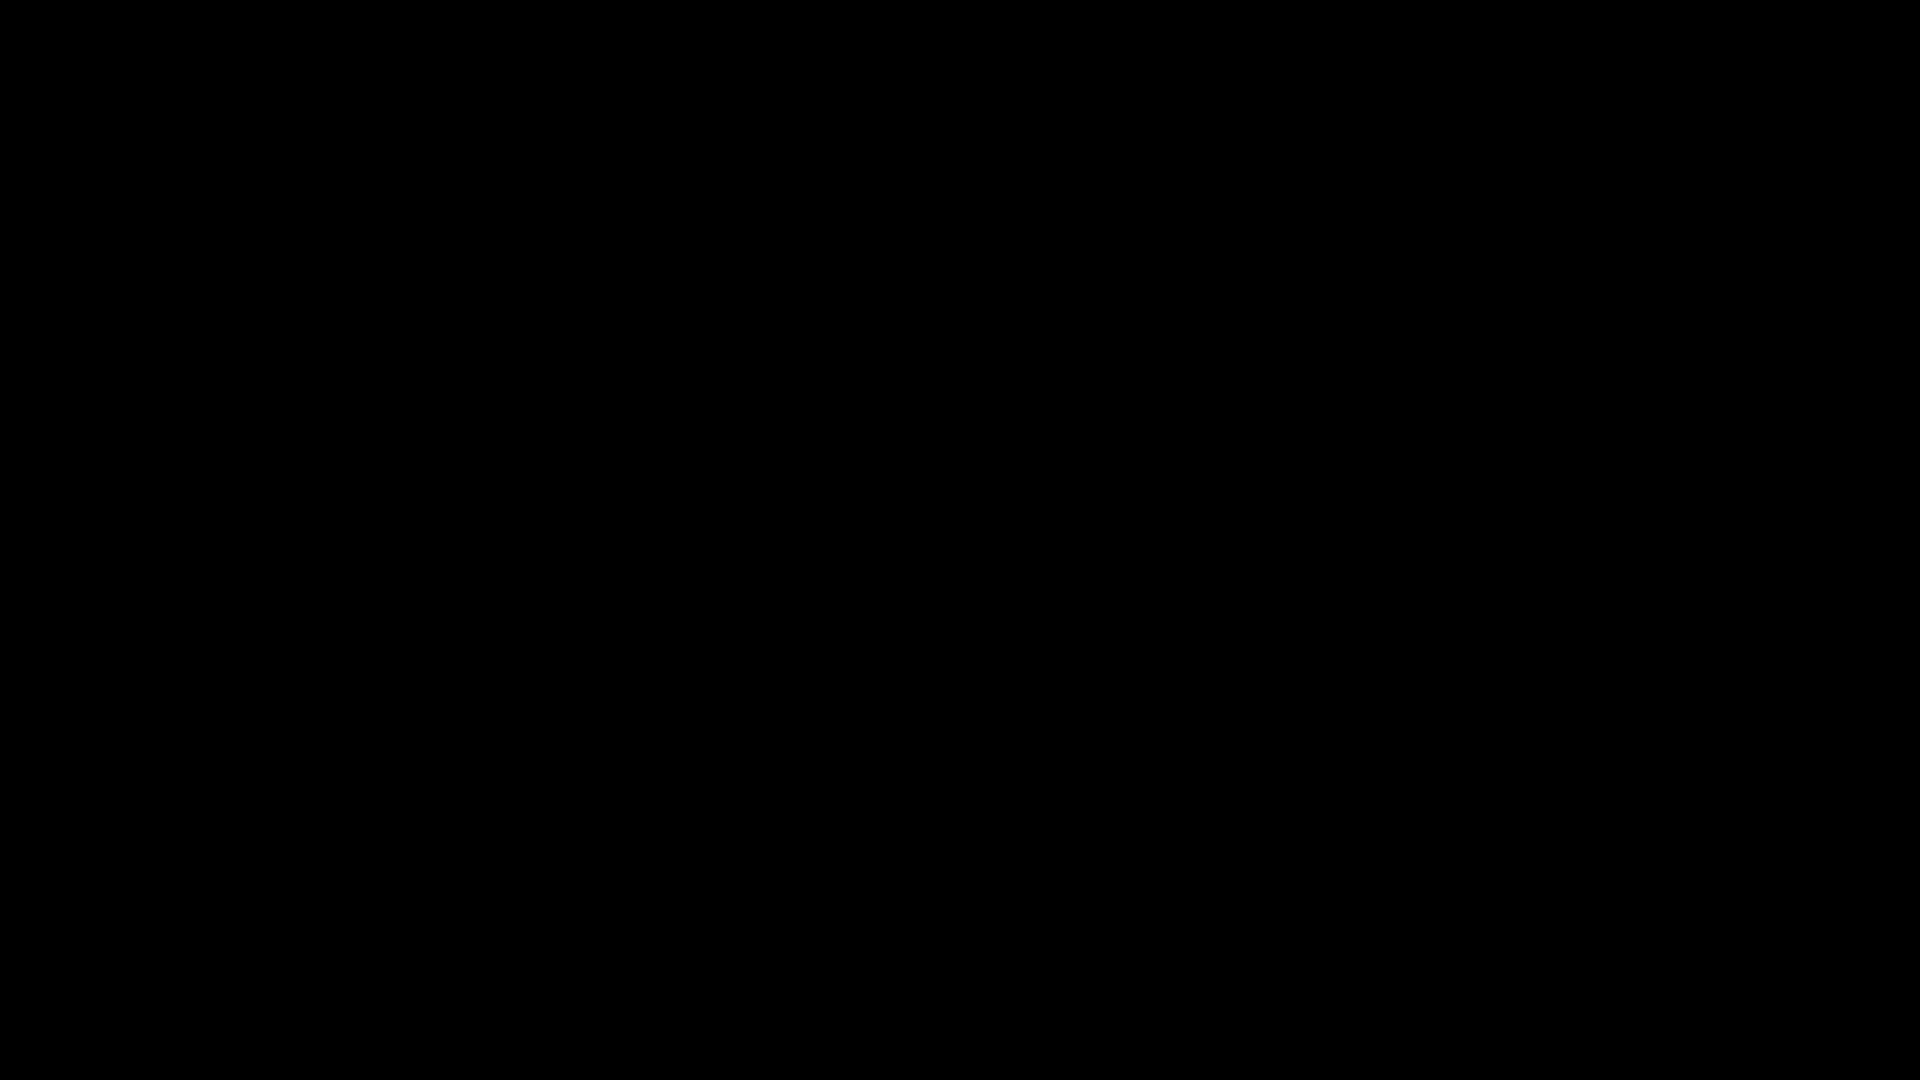 BKT, Baran Kadir Tekin, Egg Wars, Games Time BKT, Hunger Games, Master Builders, Minecraft, Minecraft nasıl yüklenir, Oyunları, Speed Builders, baran kadir, en genç youtuber, komedi, minecraft evi, minecraft izle, minecraft server, oyun portal, starBRO, survival games, BARAN KADİR TEKİN KIŞKIRTMA Vlog GIFs